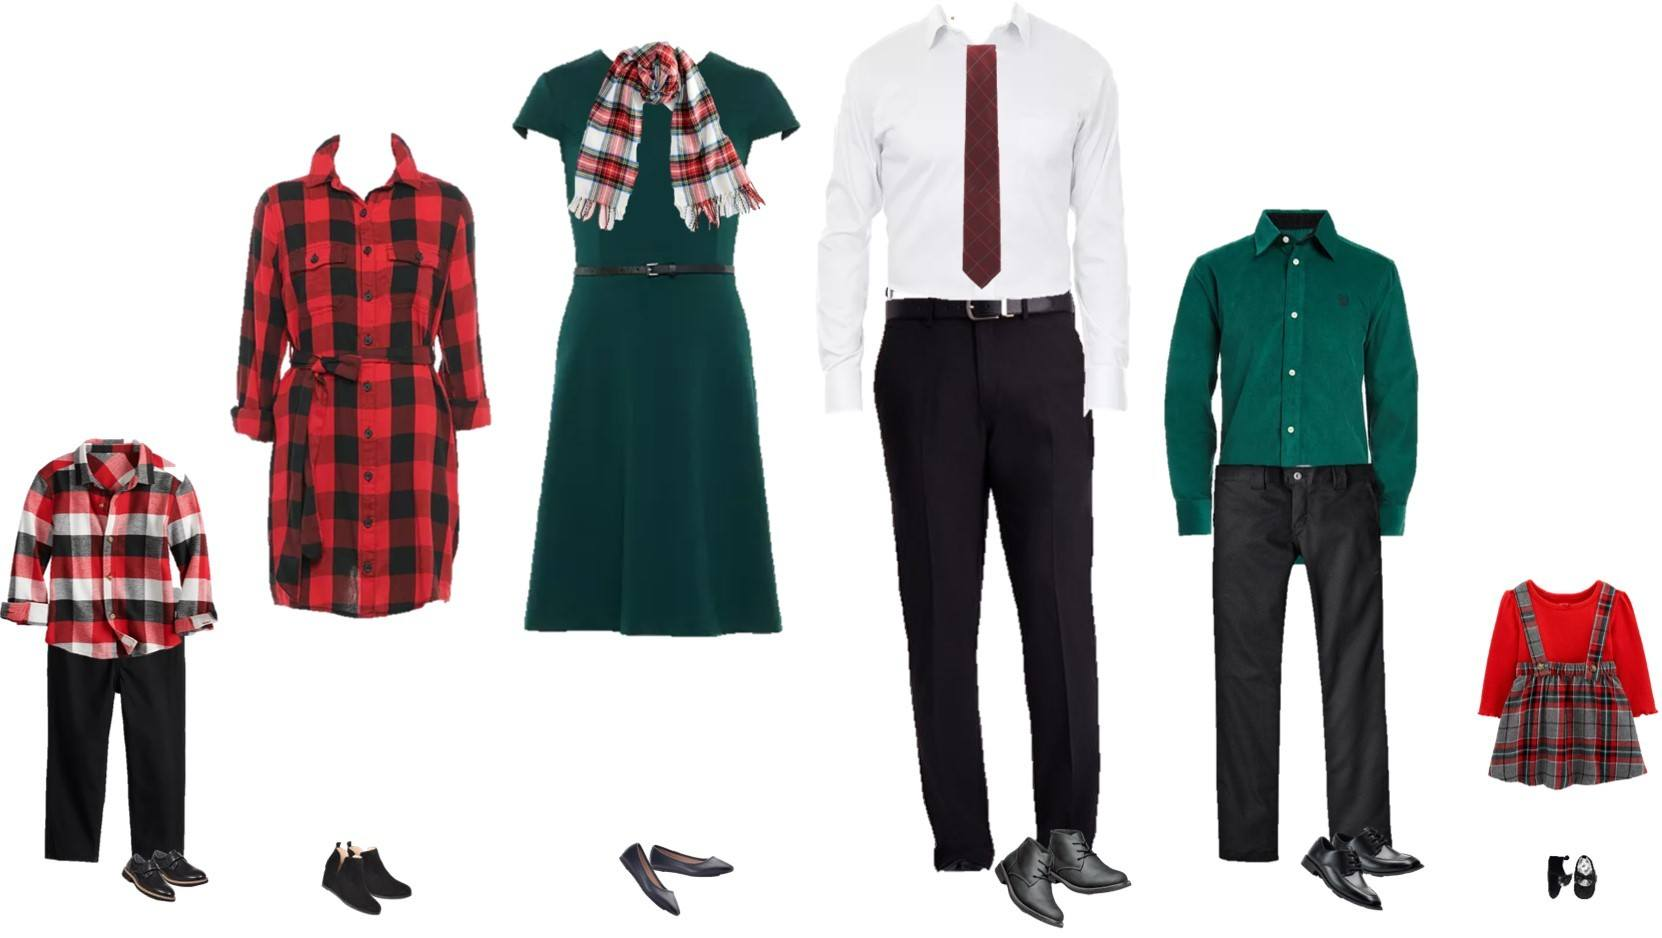 Dressy Family Christmas Outfits - green dress, buffalo plaid, green shirt black pants, plaid jumper.